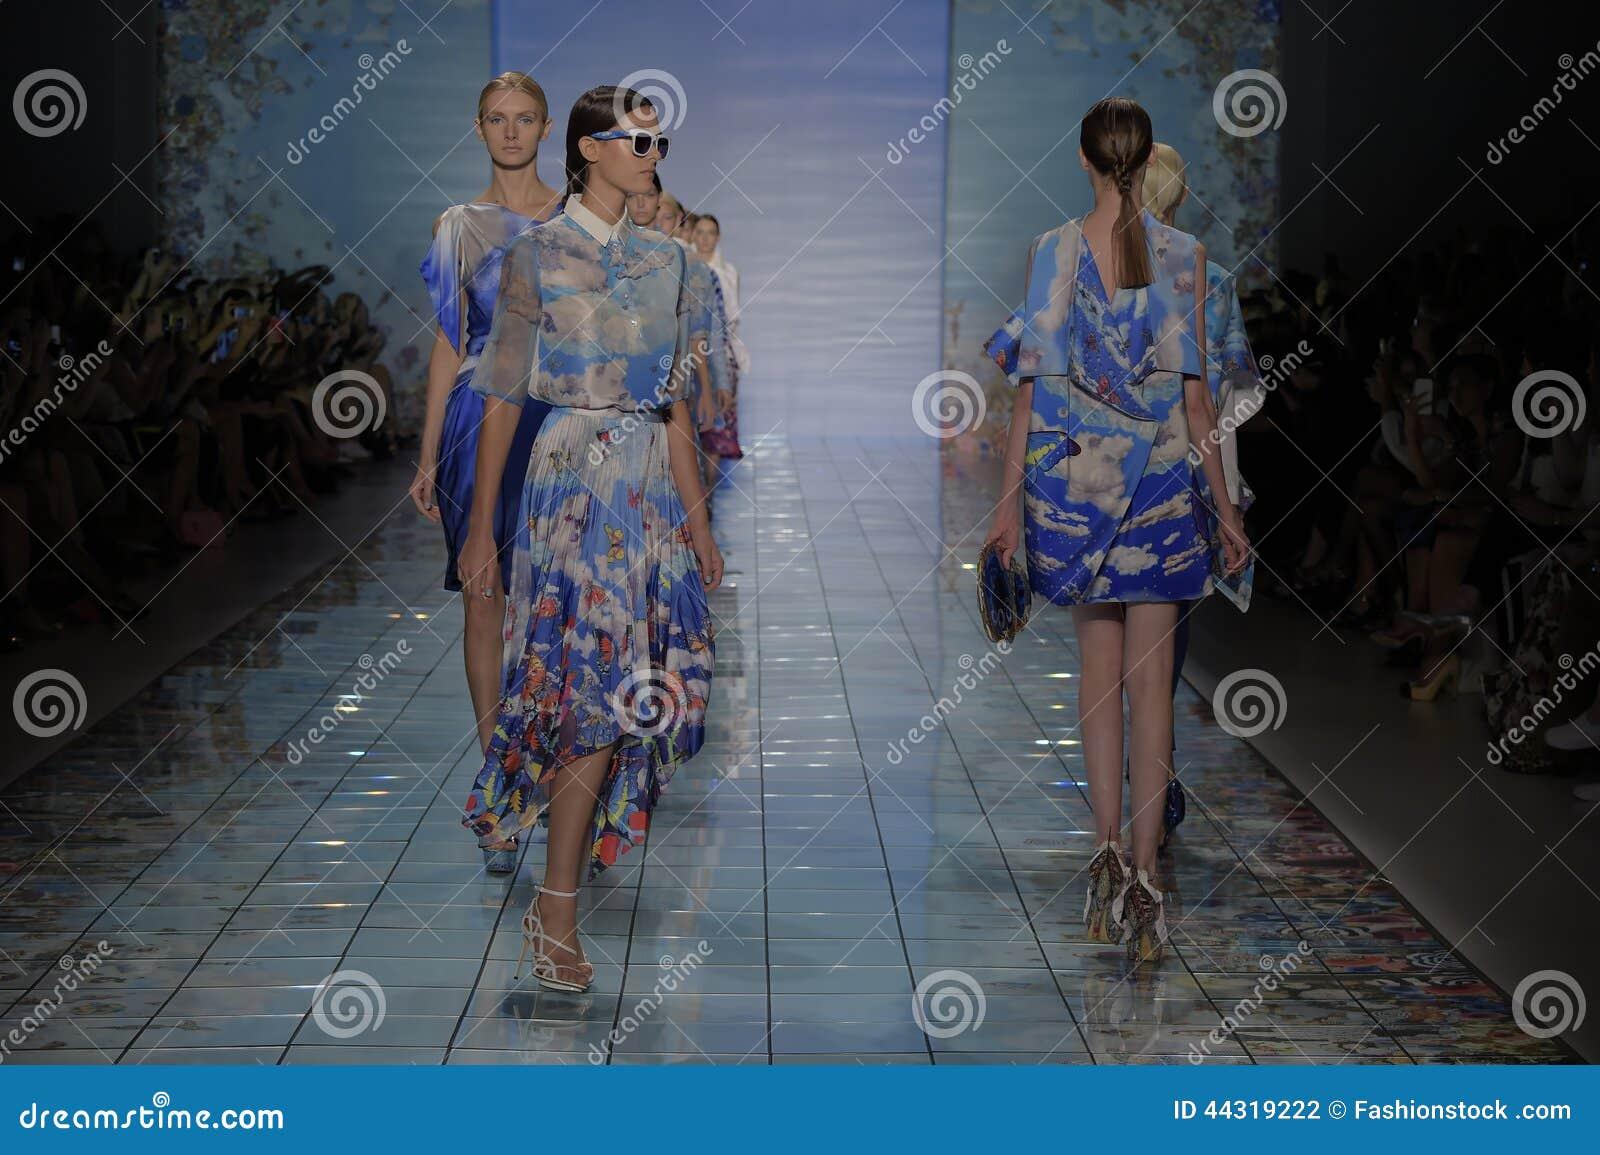 Lagerfeld karl zalando for sportswear, Elite kd 5 Nike high top pictures